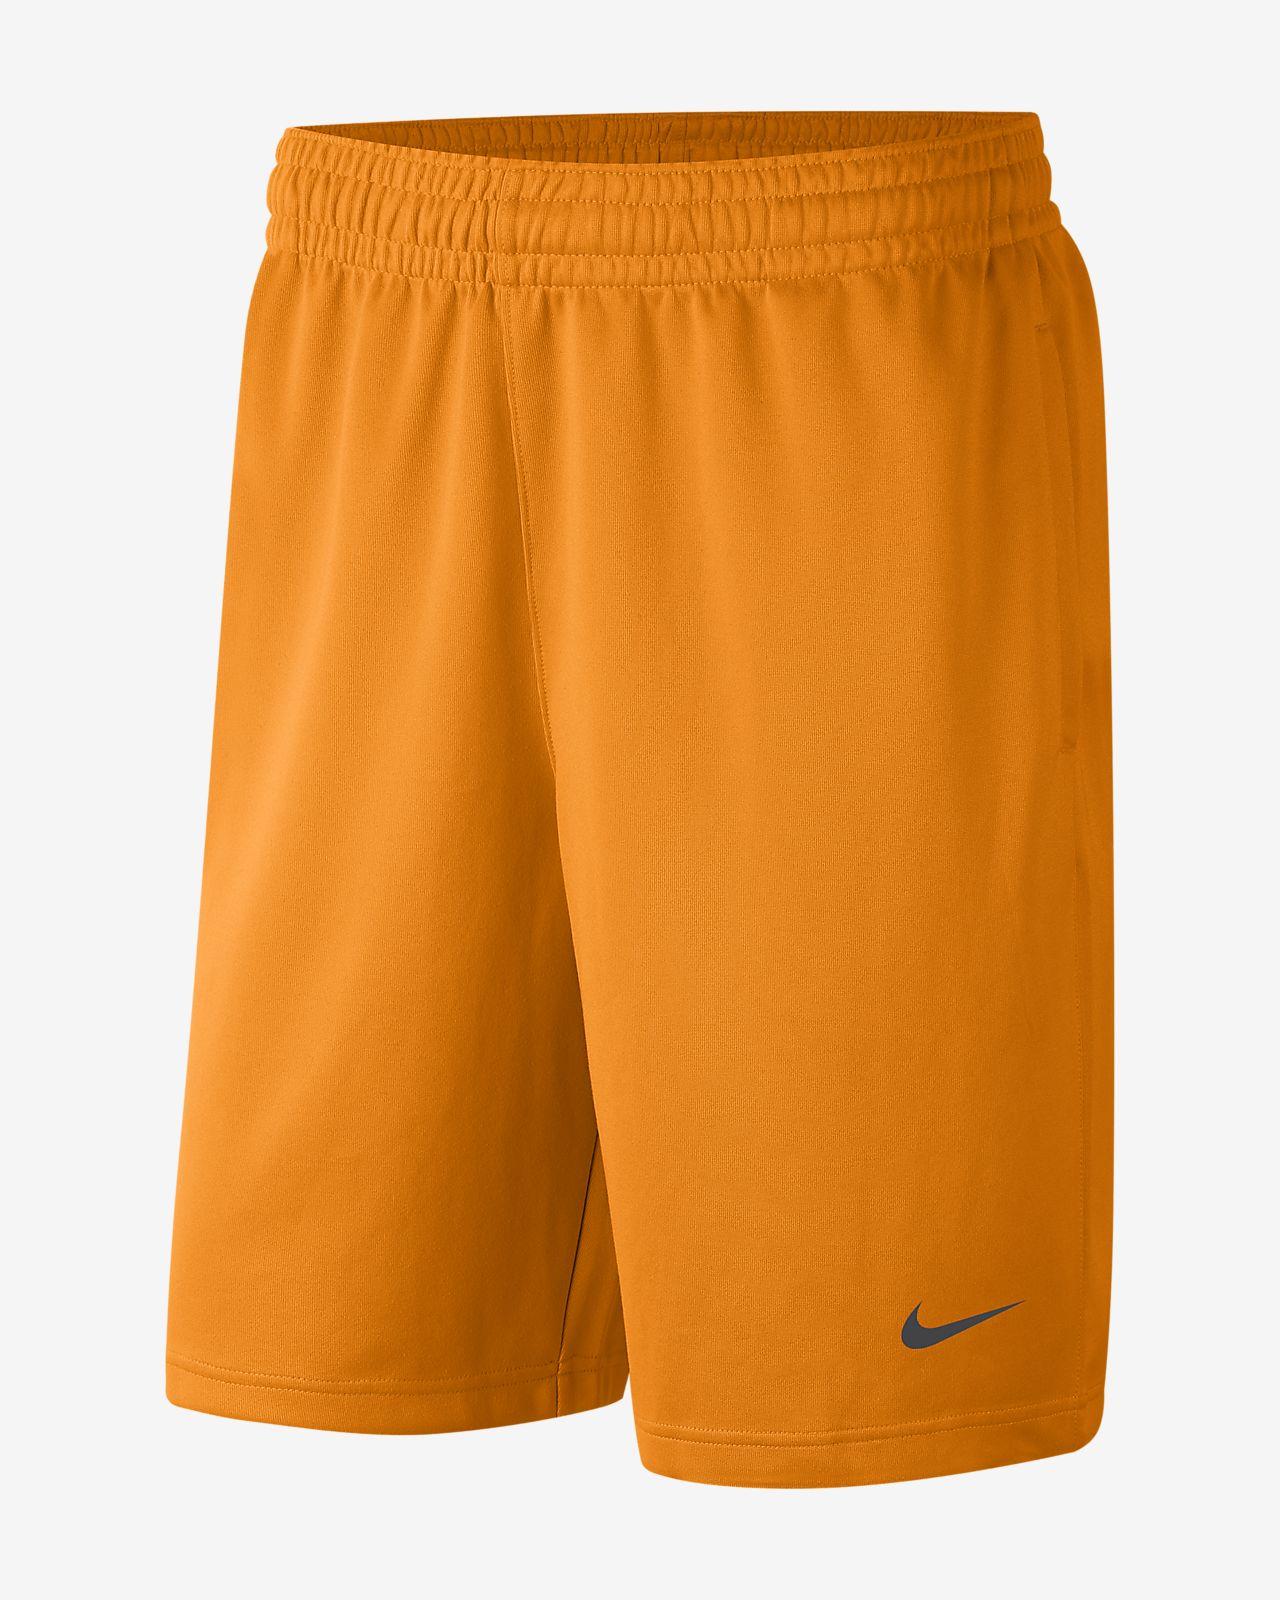 Nike College Spotlight (Tennessee) Men's Shorts